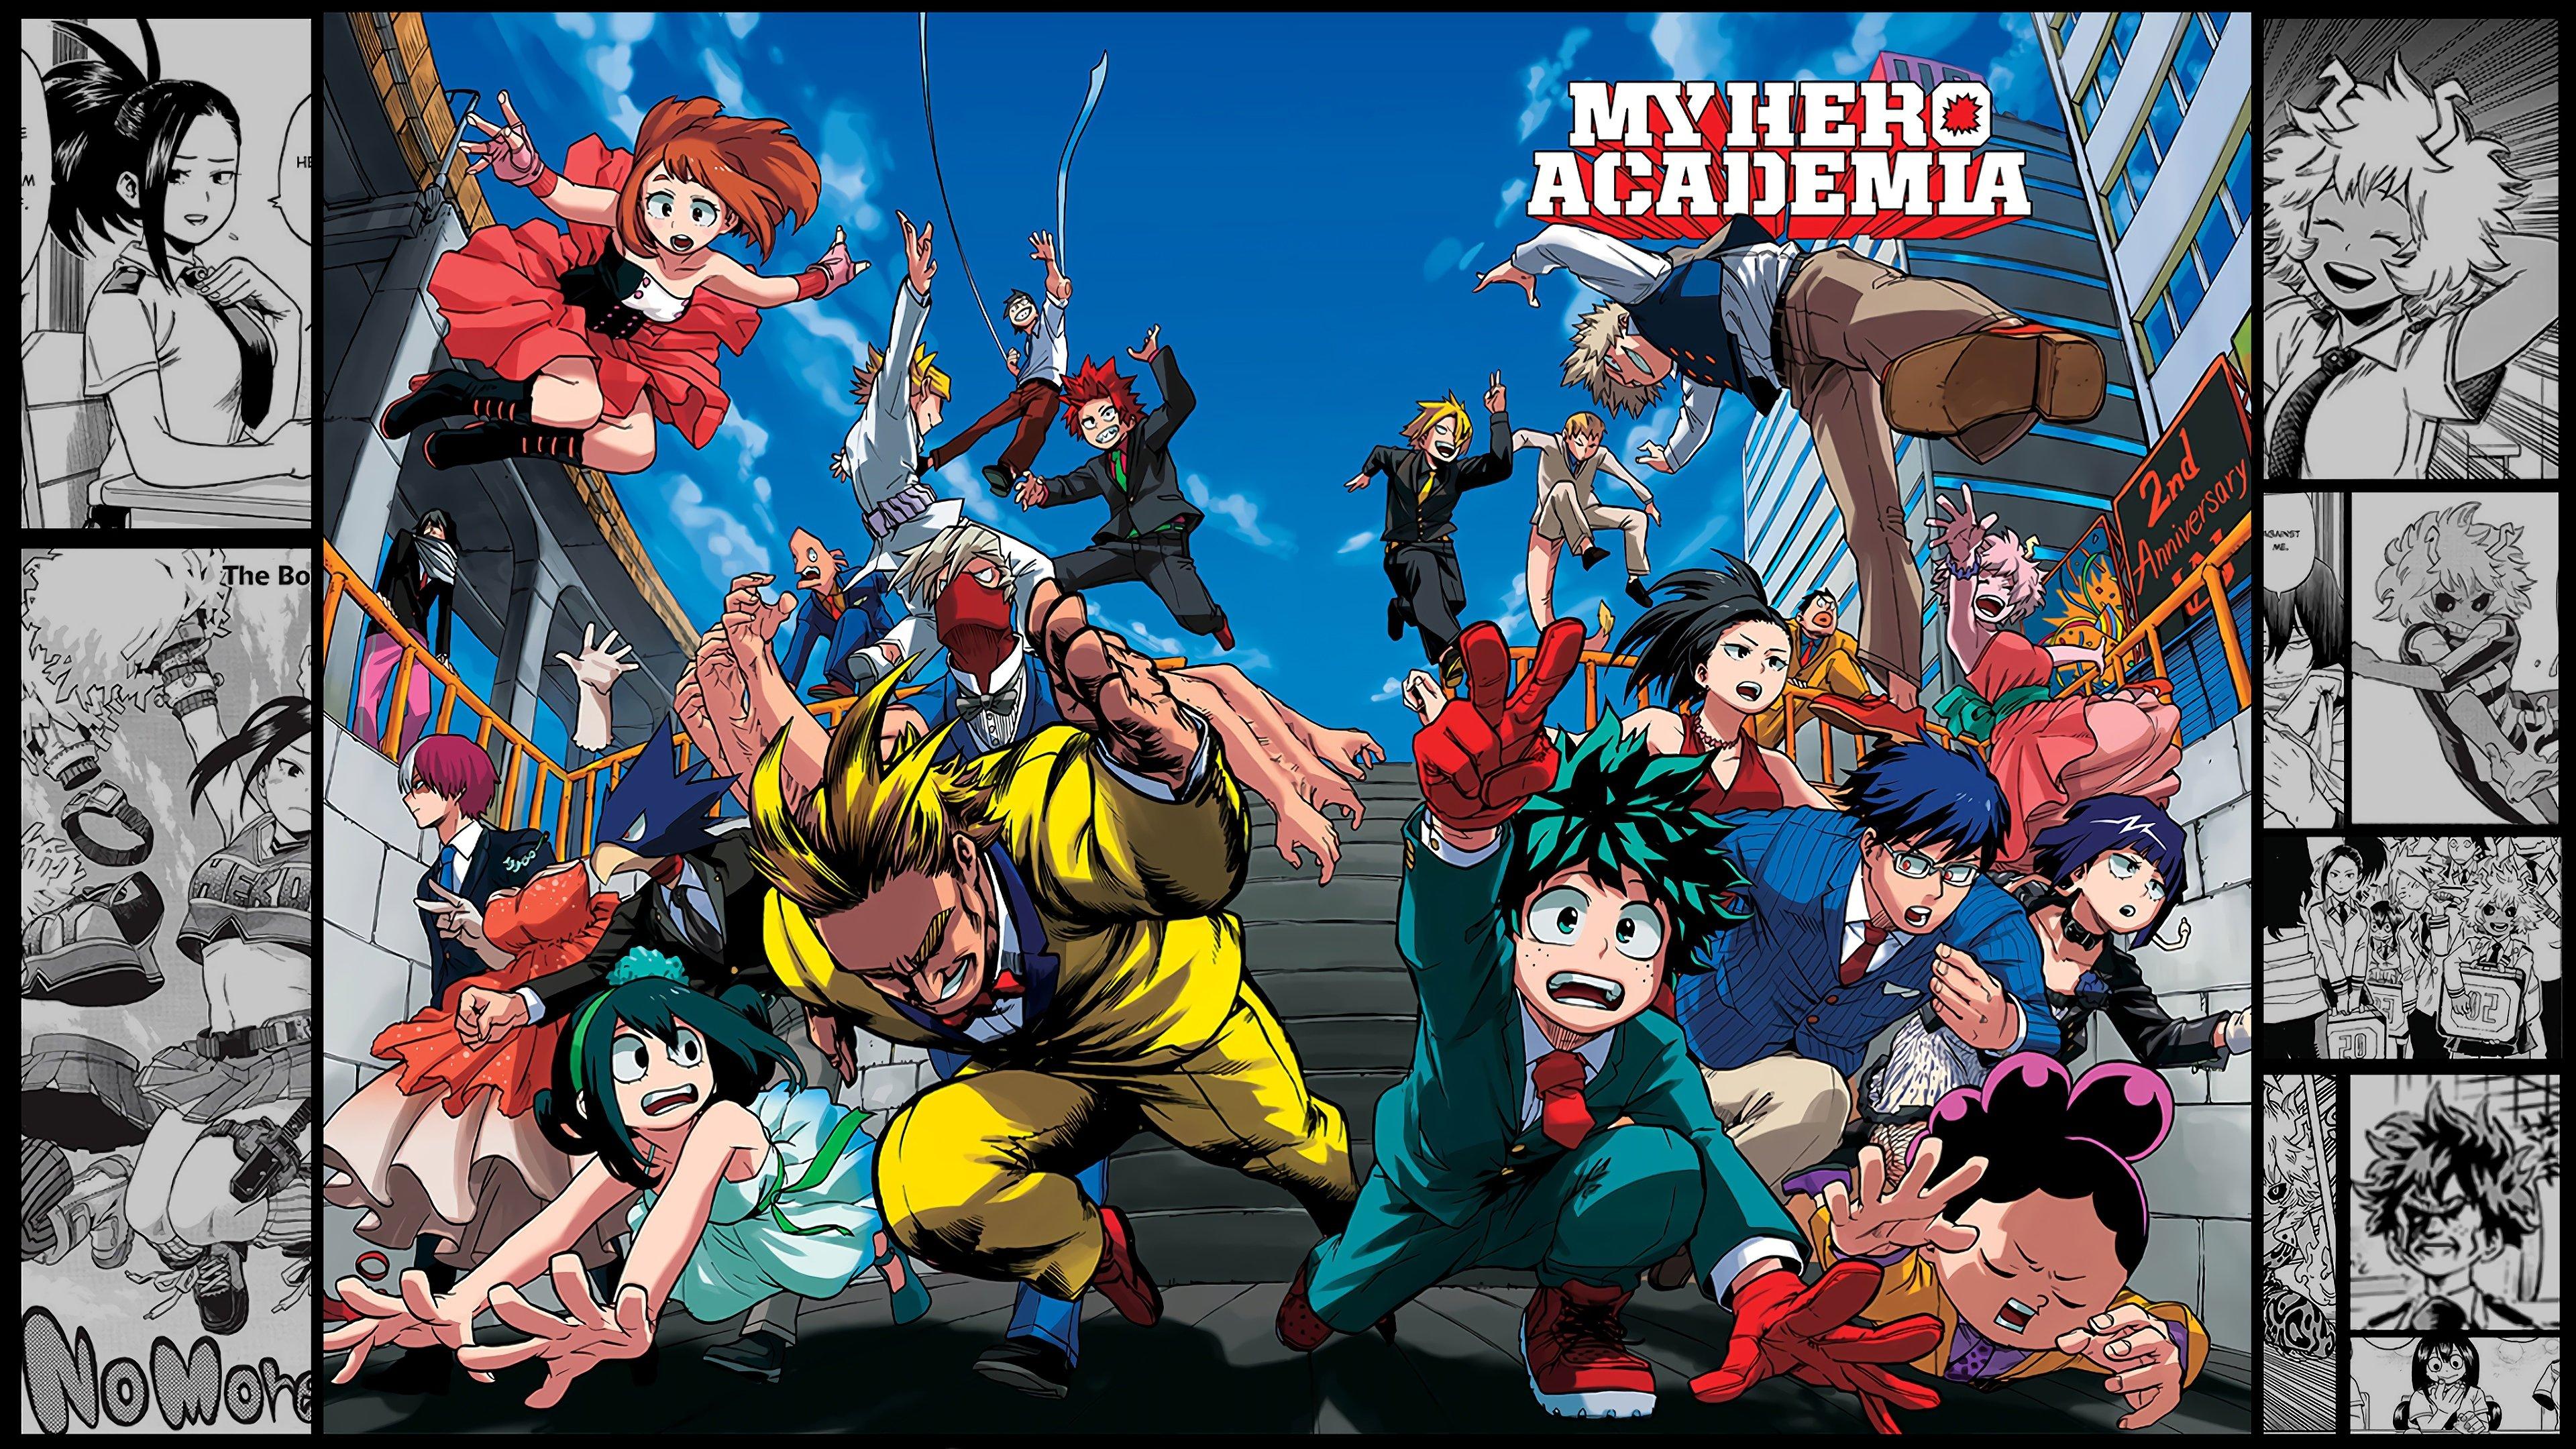 Fondos de pantalla Anime My Hero Academia Personajes Poster